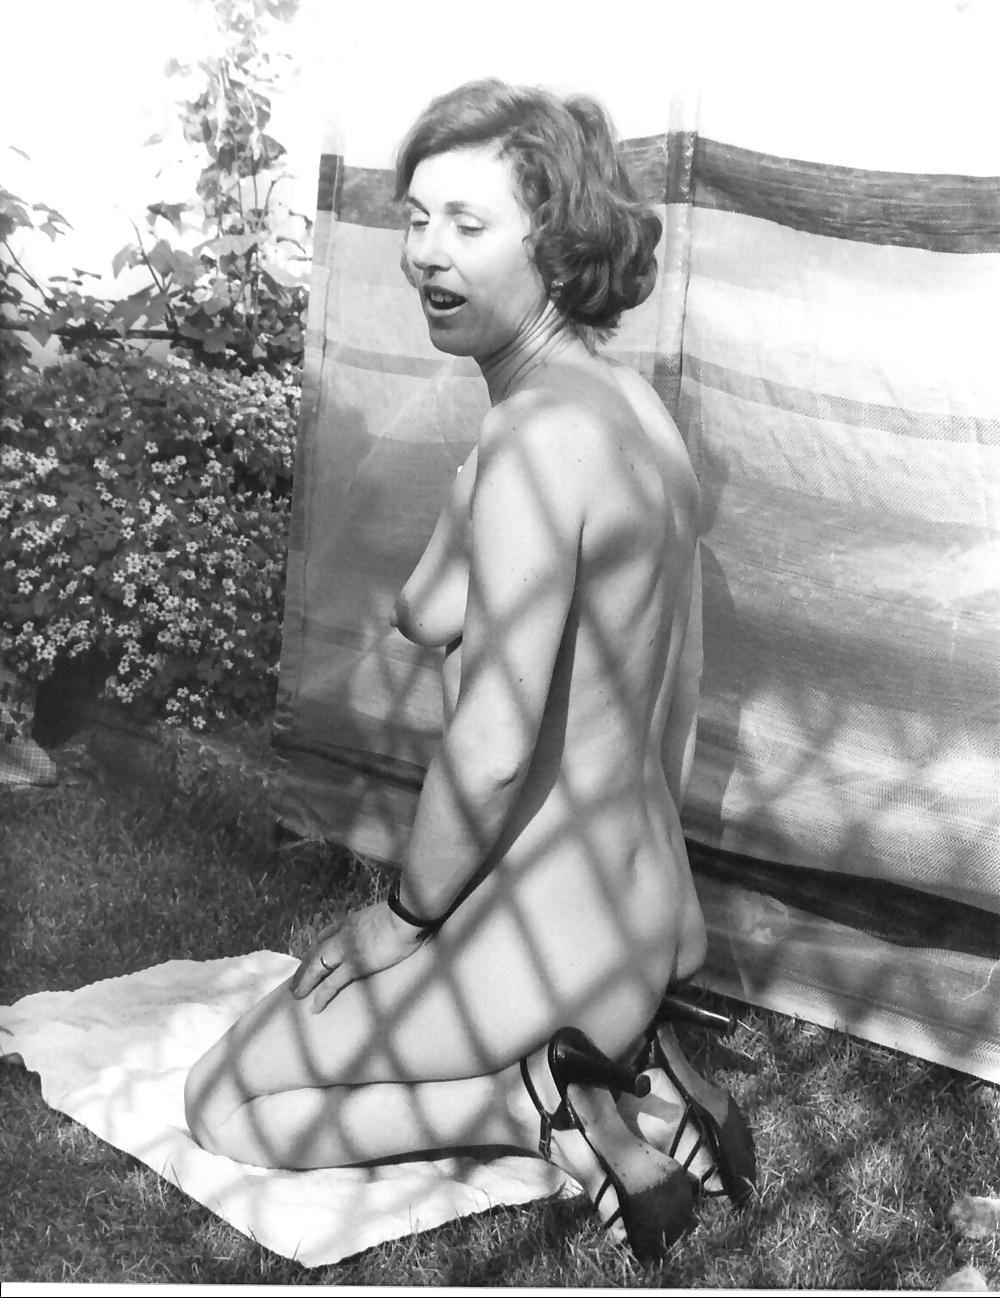 Vintage milf porn 4 фотография